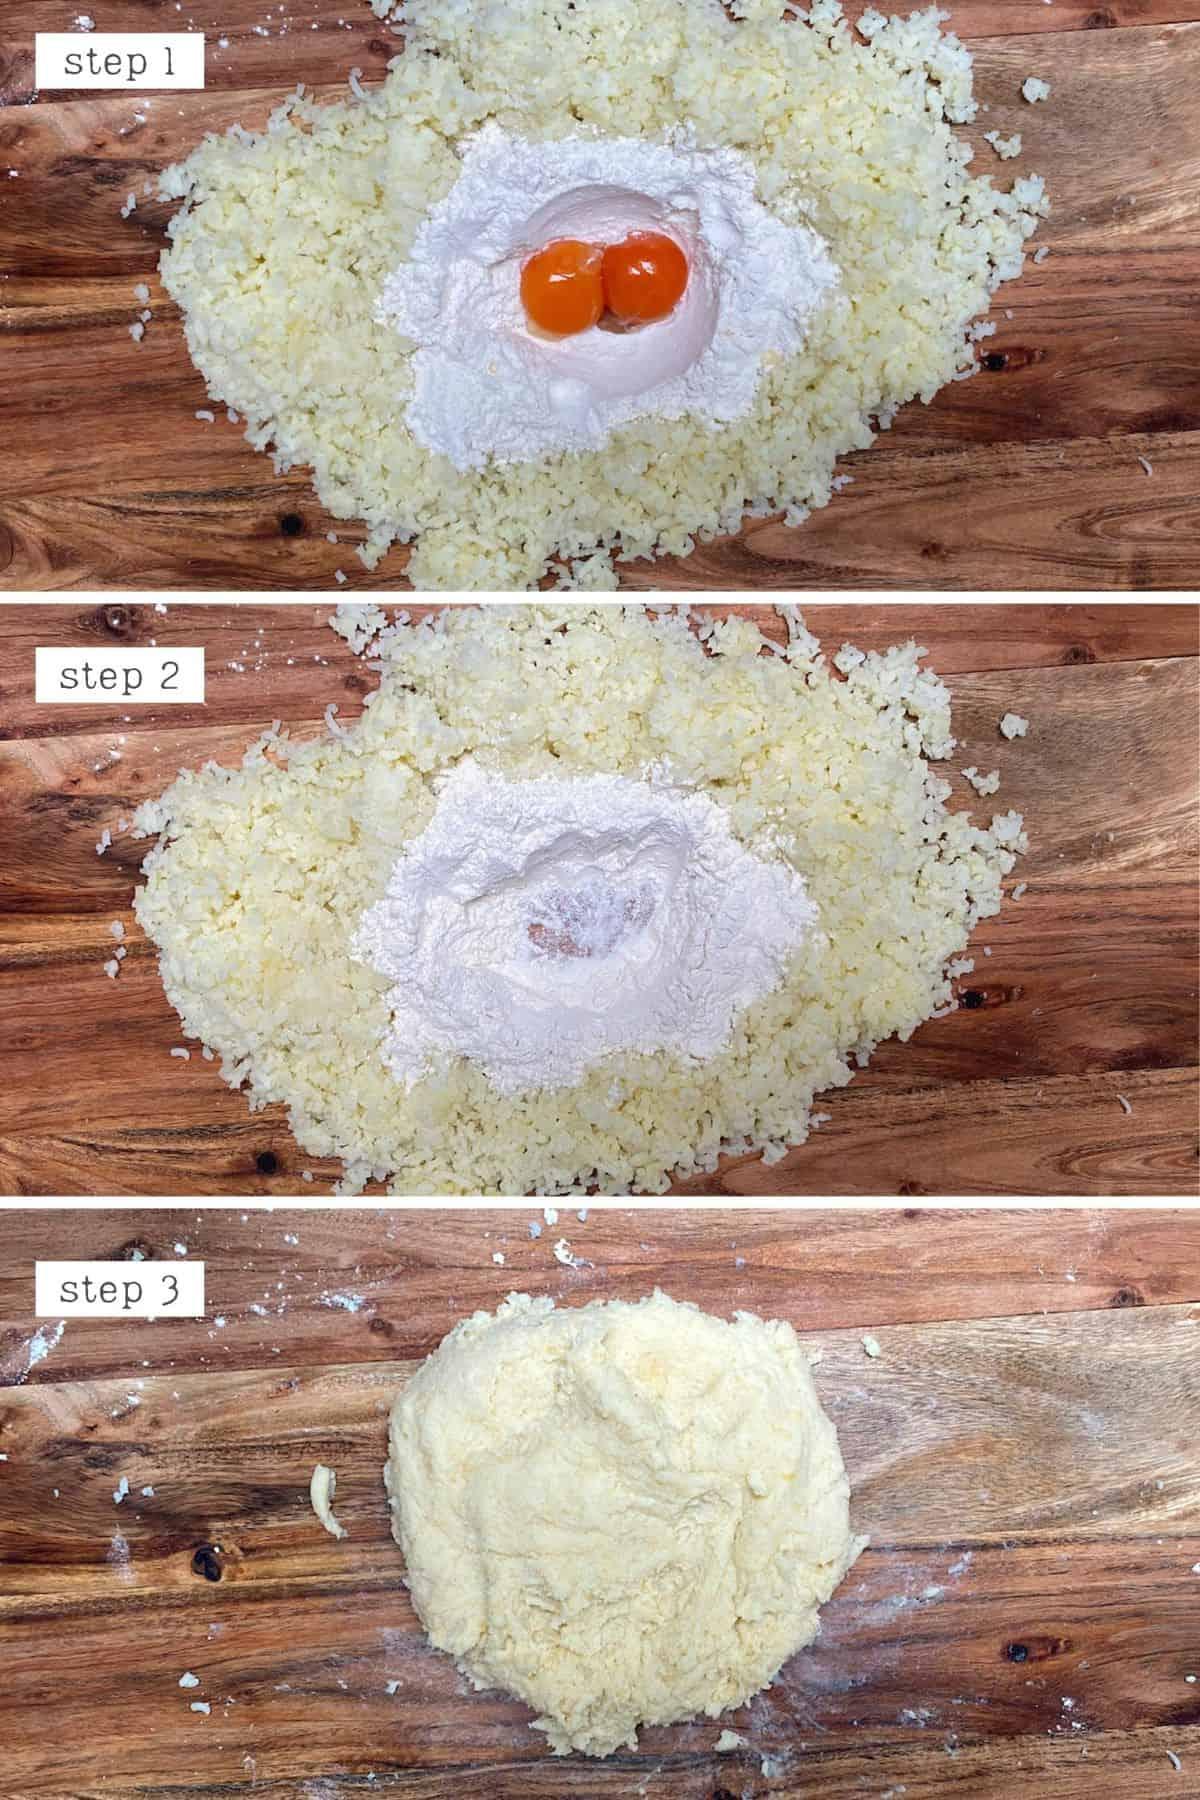 Steps for making gnocchi dough